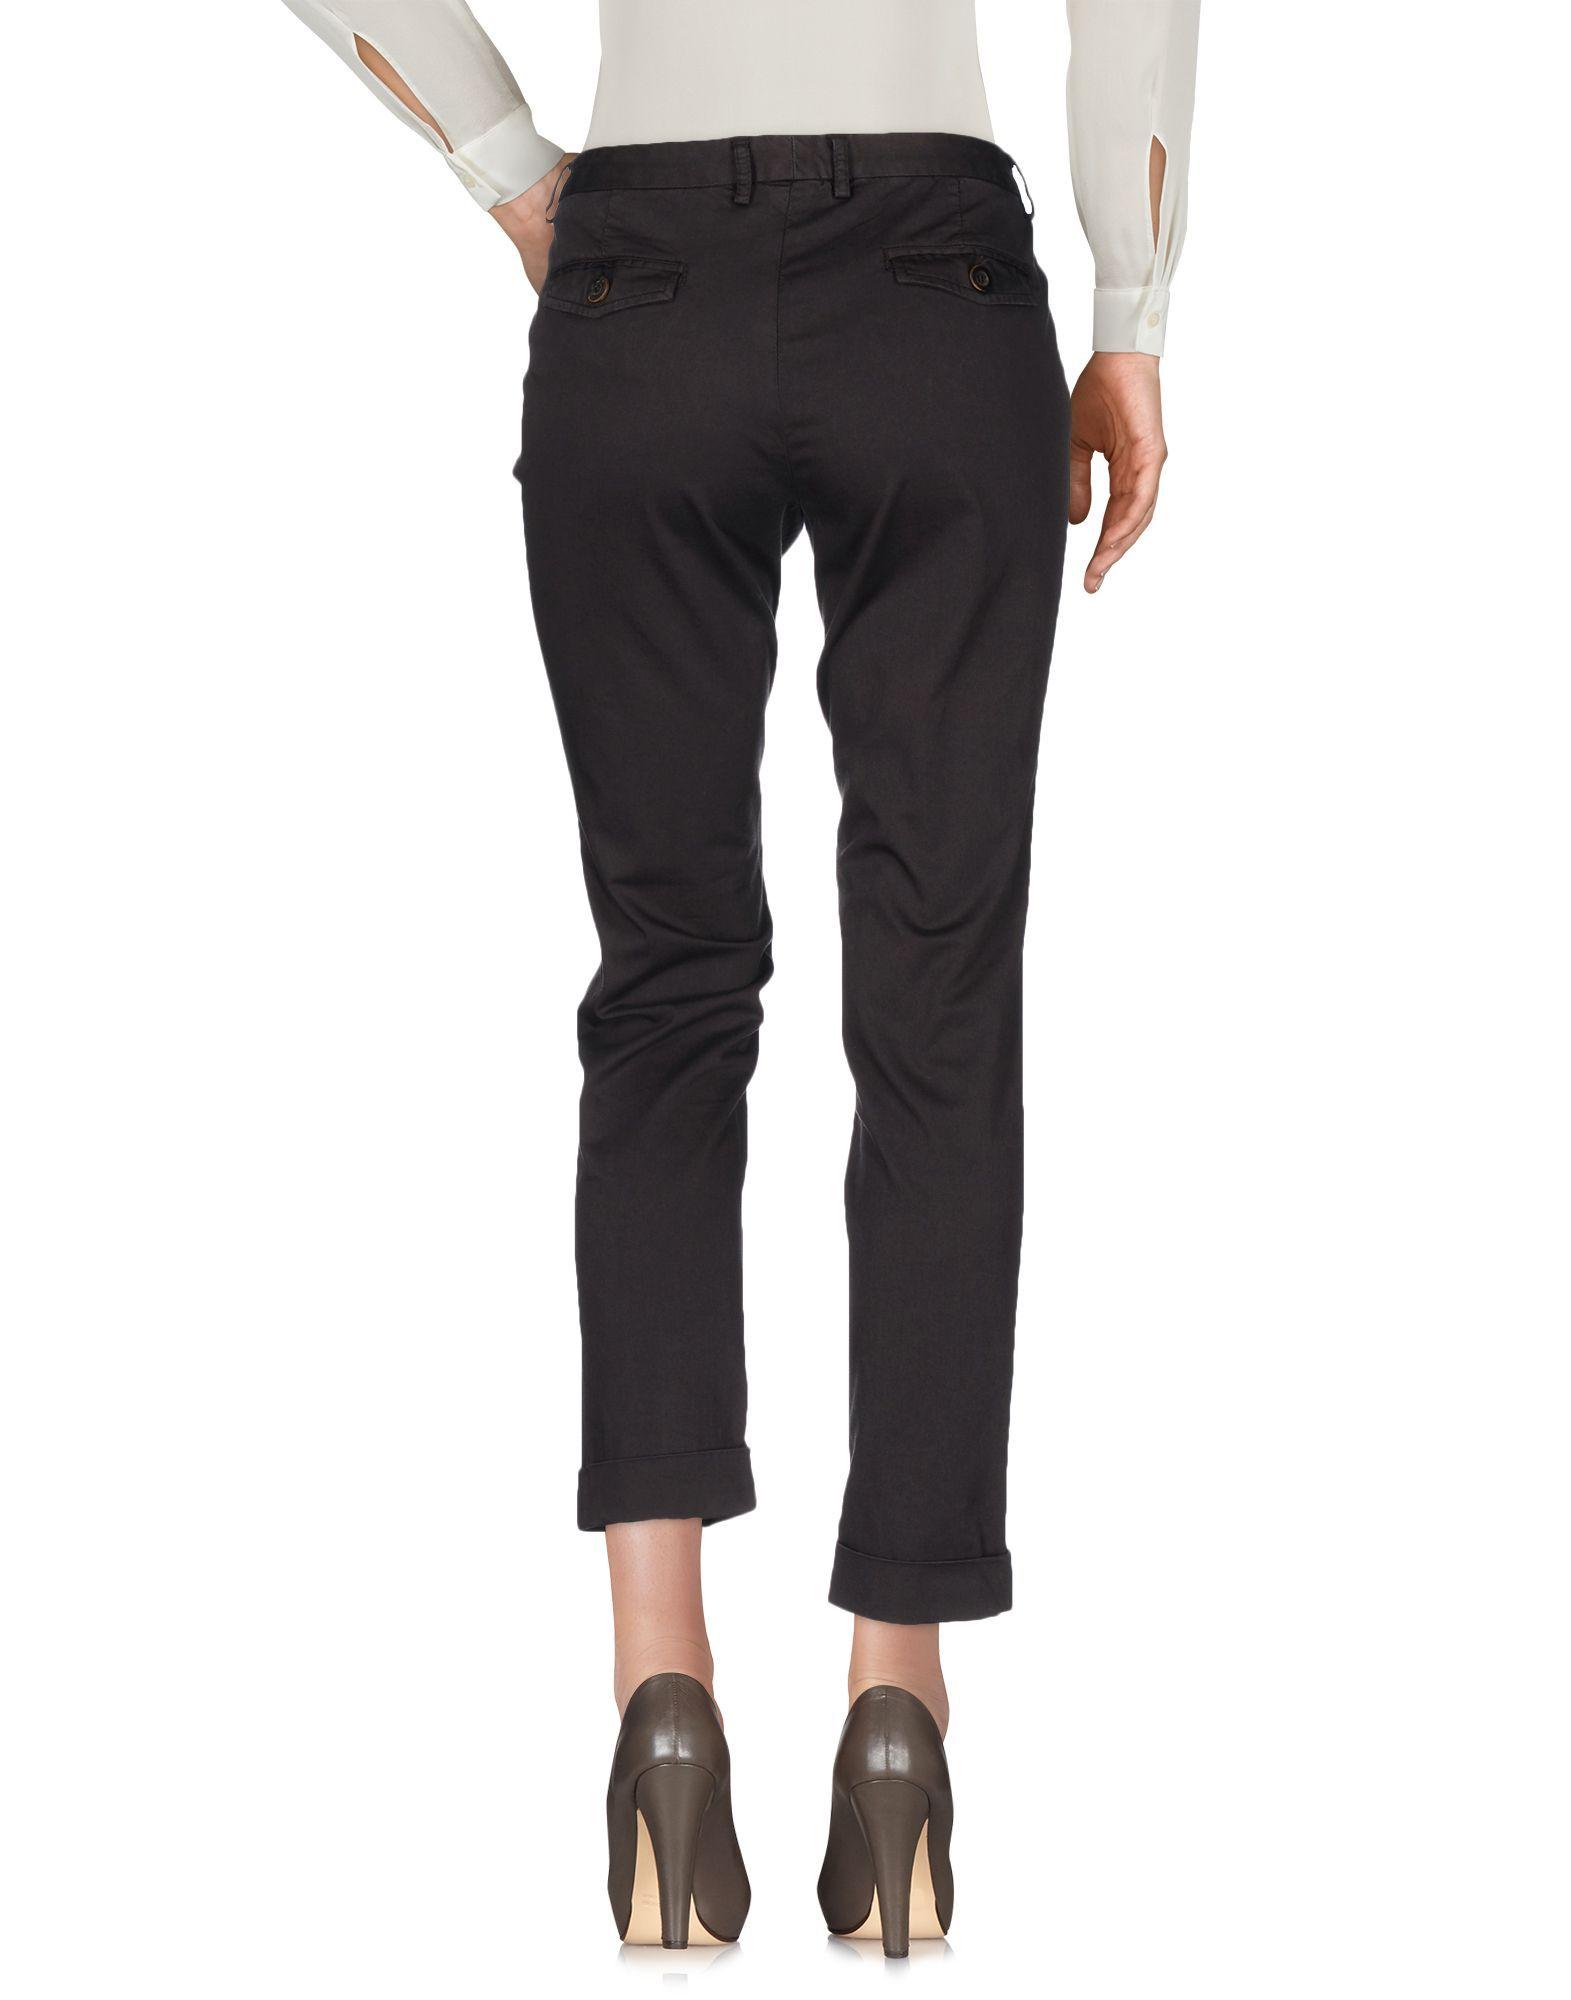 Maliparmi Dark Brown Cotton Tapered Leg Chino Trousers